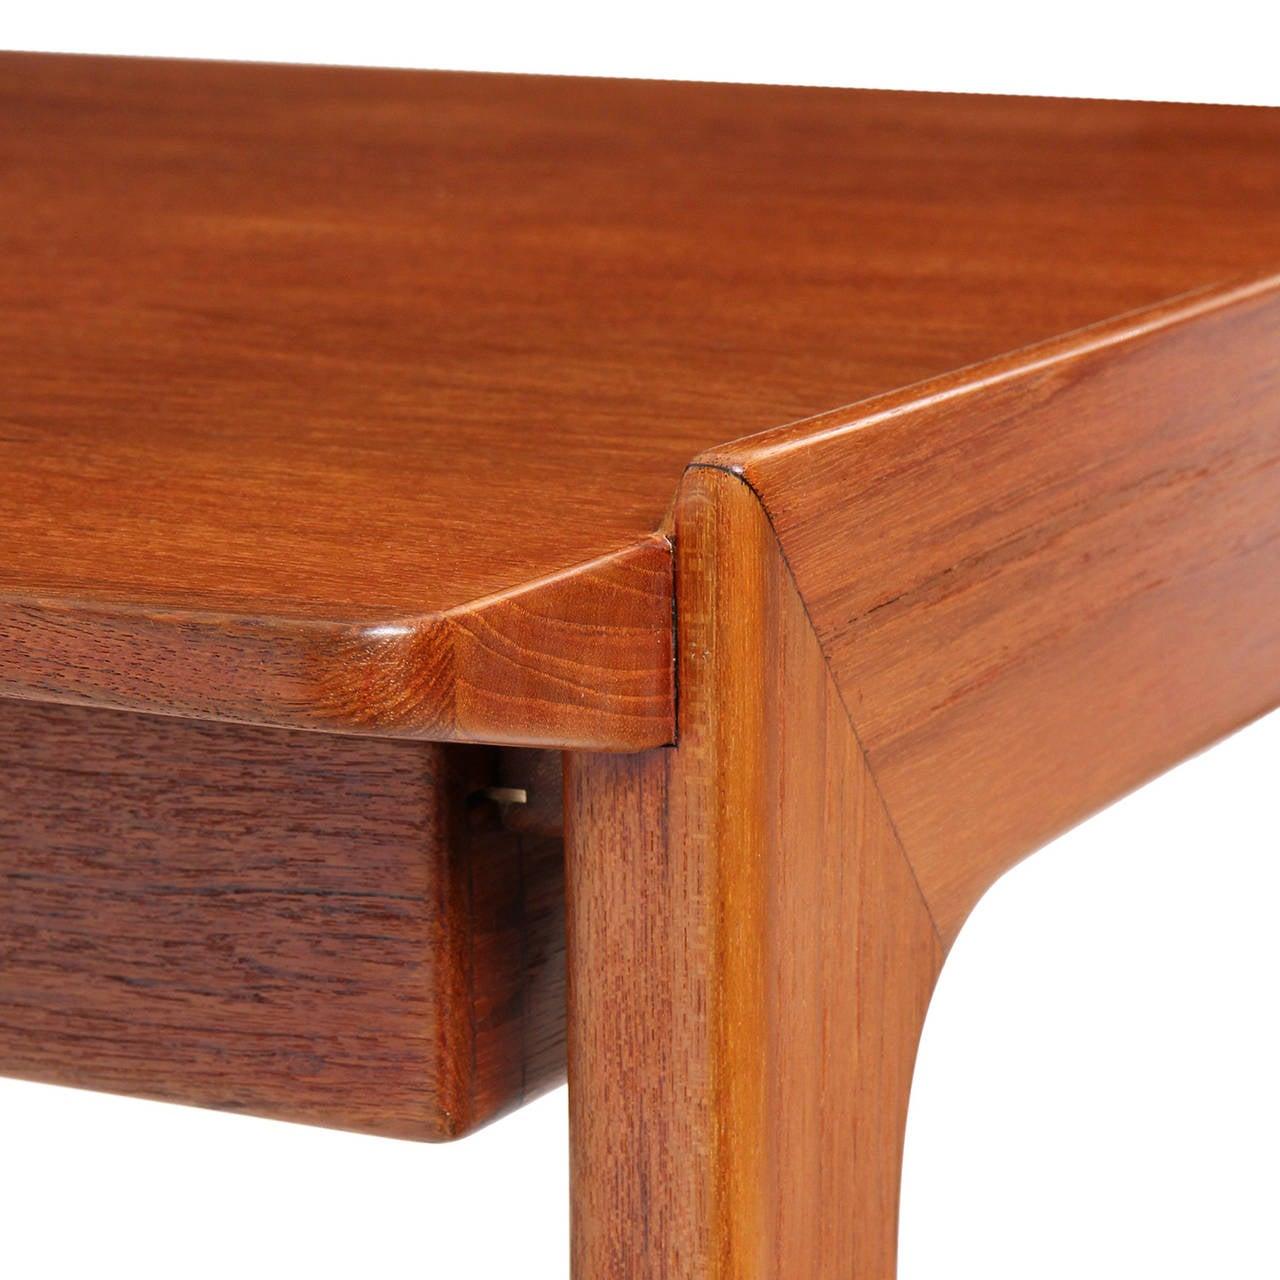 Danish Teak Writing Desk by Tove & Edvard Kindt-Larsen For Sale